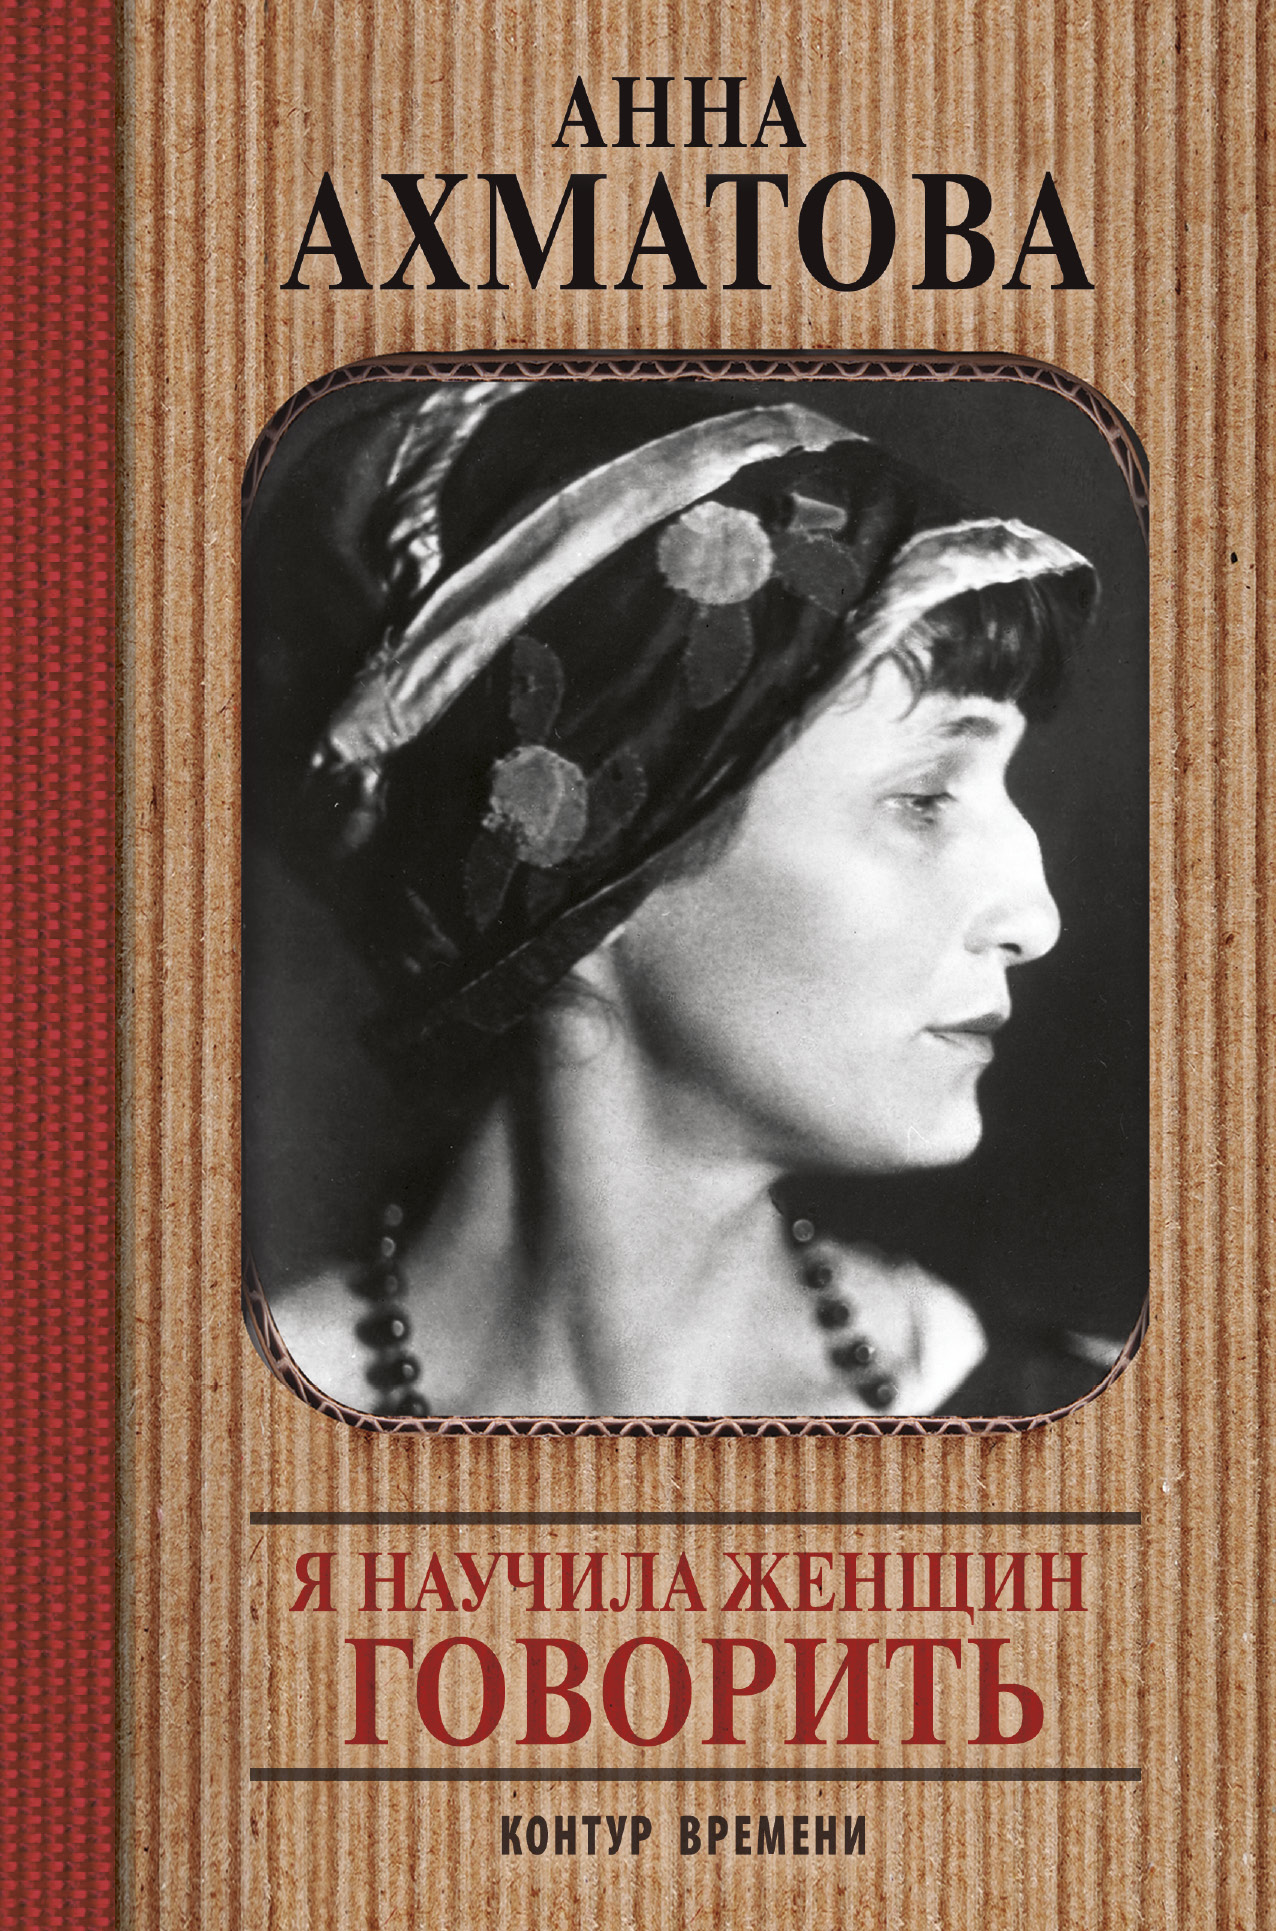 Ахматова А.А. Я научила женщин говорить ахматова анна андреевна я научила женщин говорить